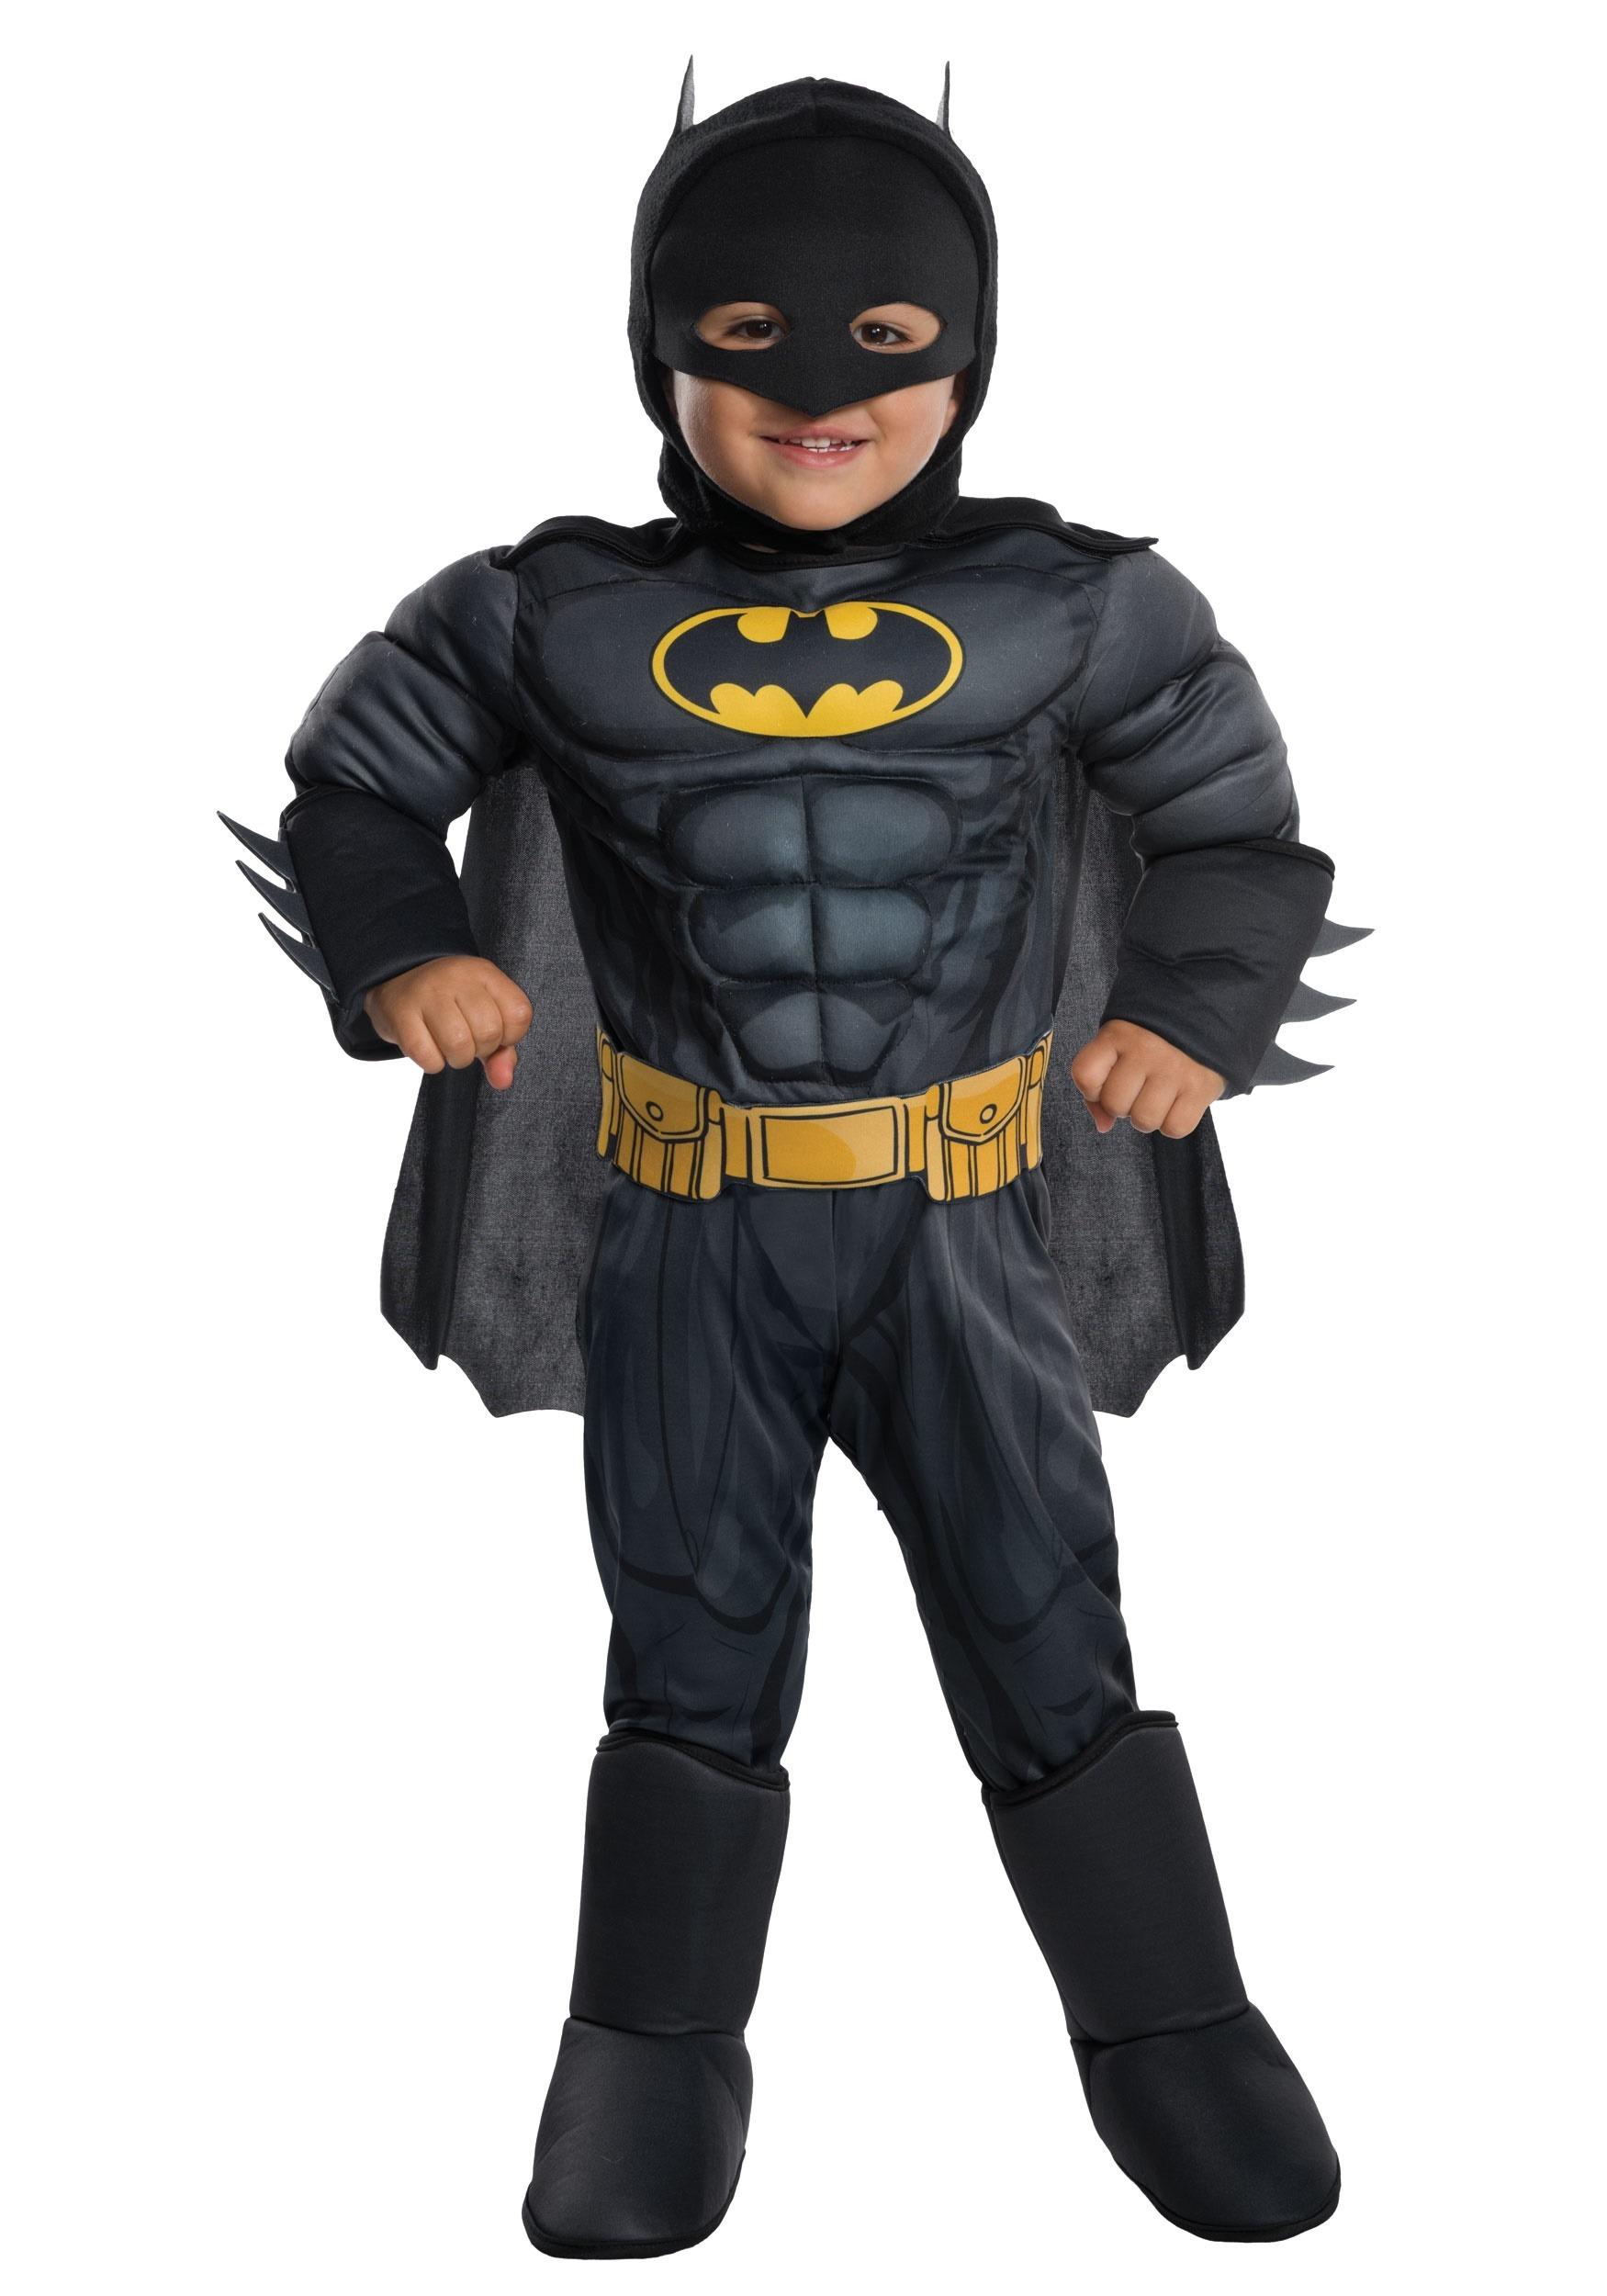 Batman Deluxe Costume for Toddlers   Toddler Superhero Costume